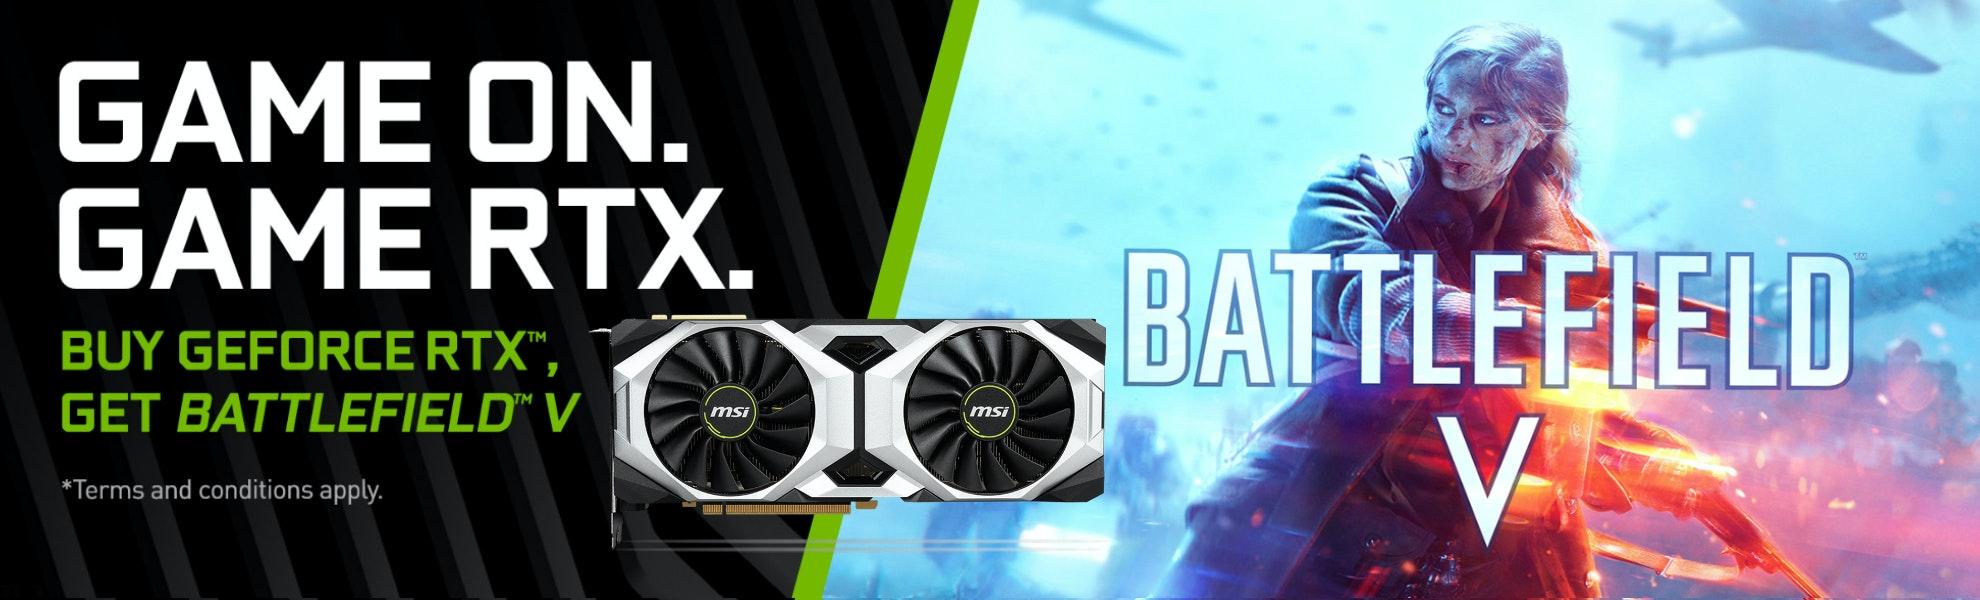 MSI GeForce RTX 2080 VENTUS 8G OC